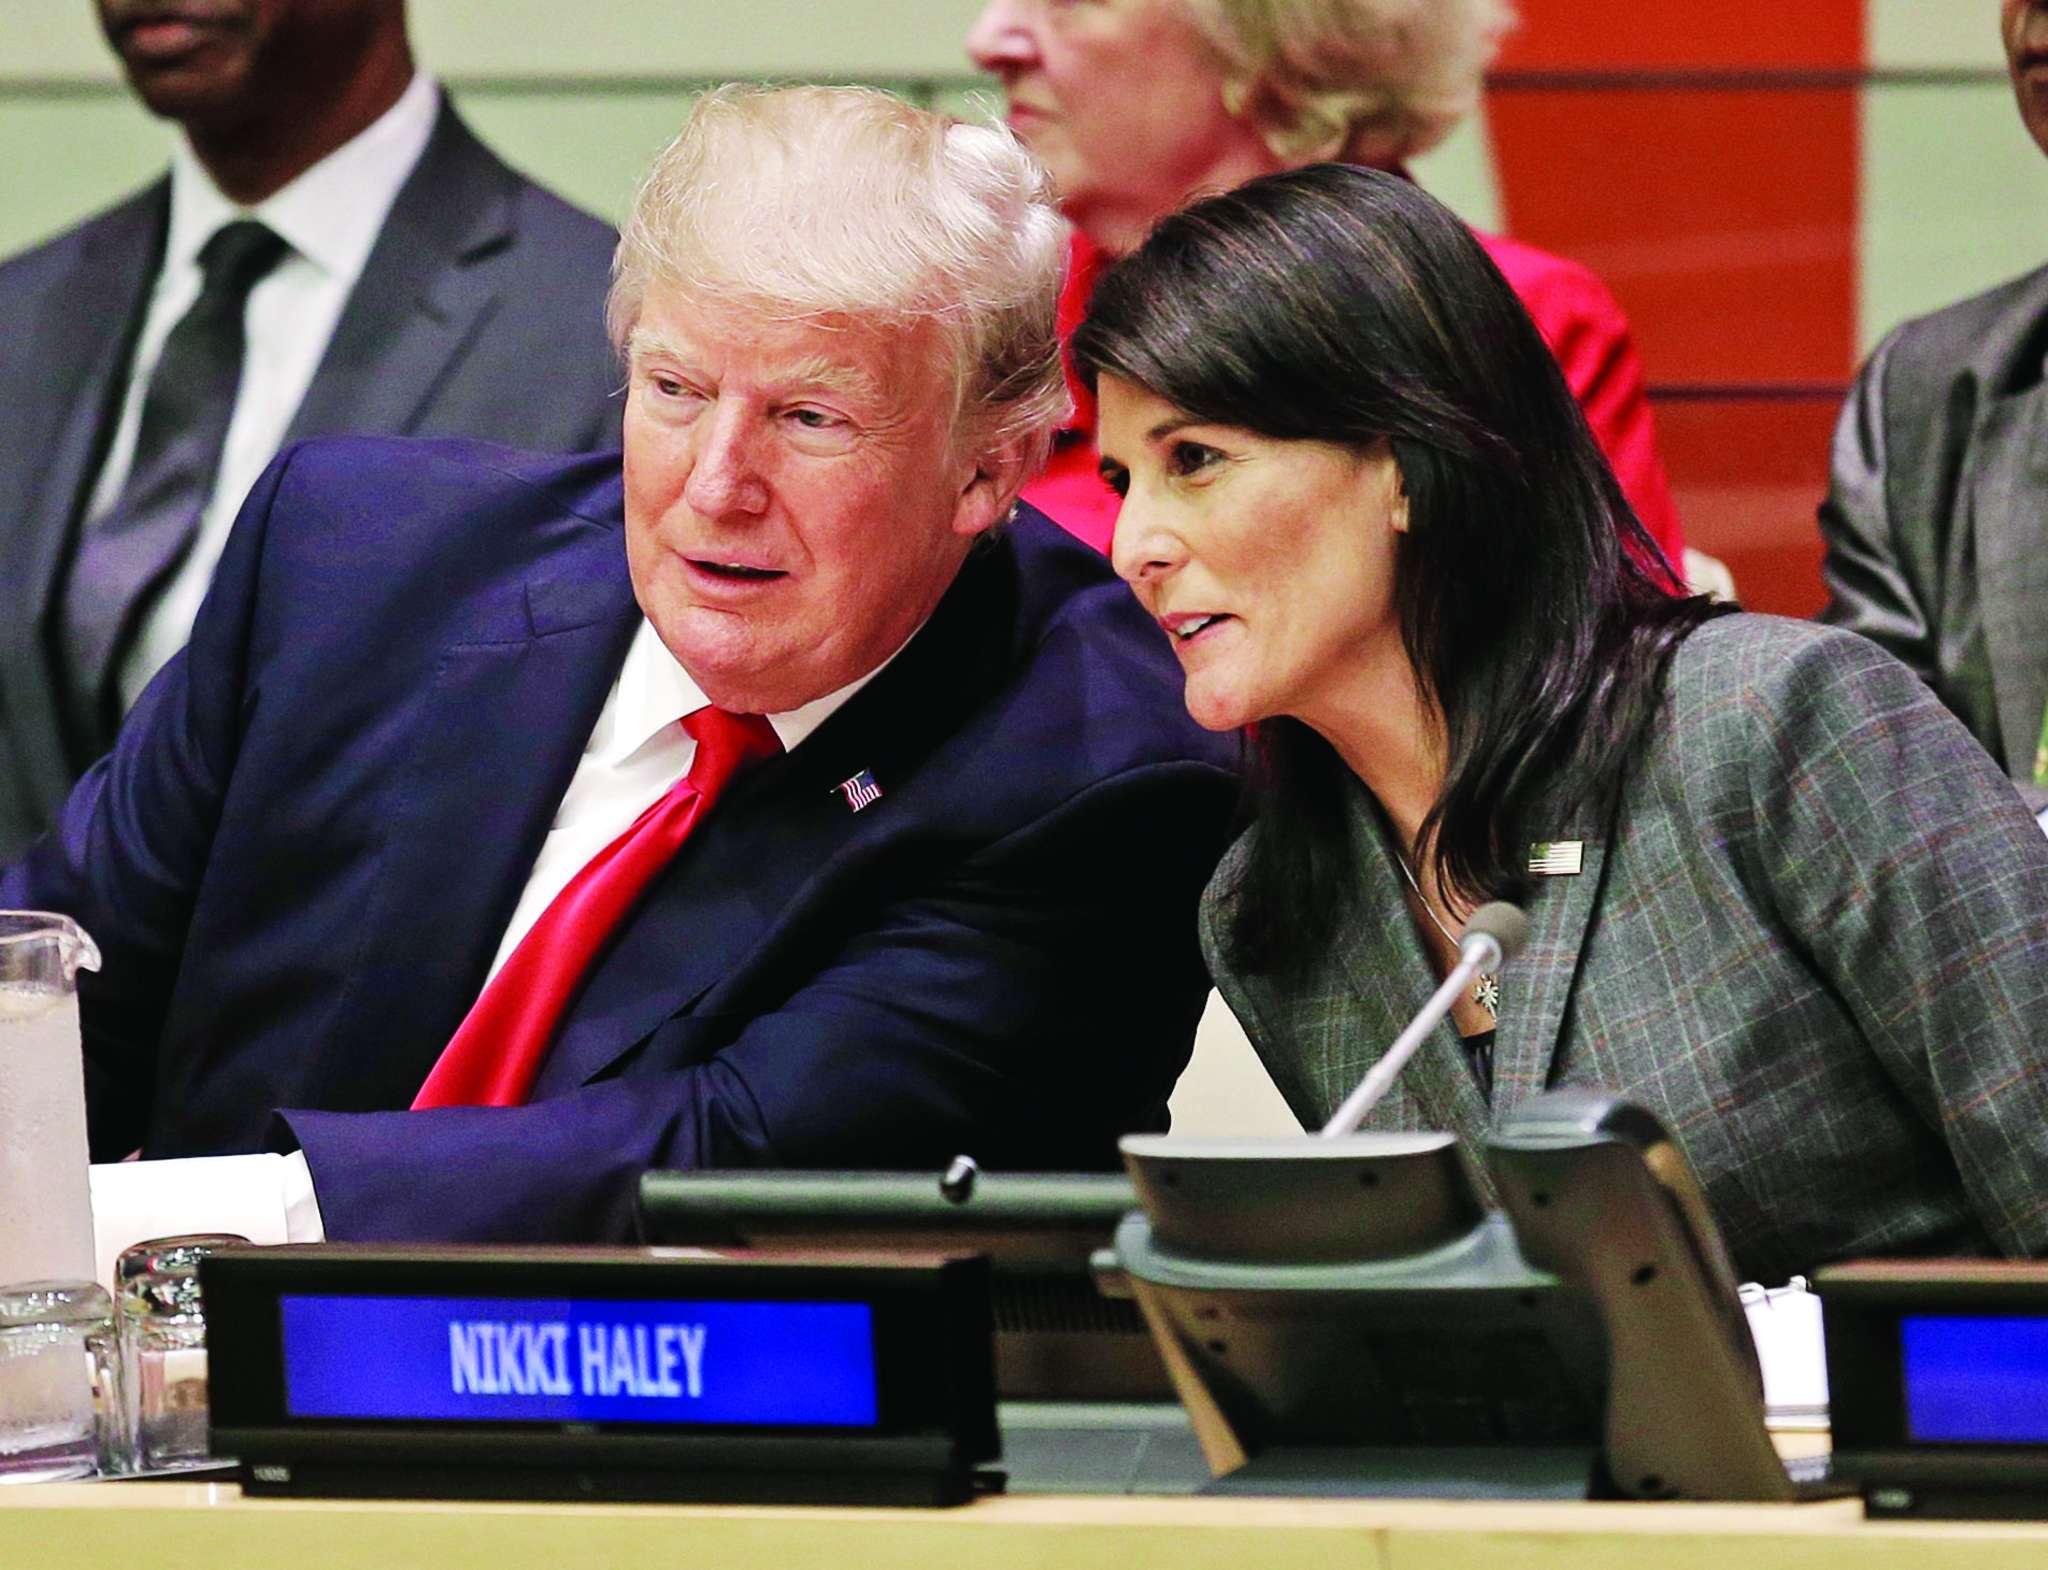 President Trump speaks with Nikki Haley, U.S. ambassador to the U.N.